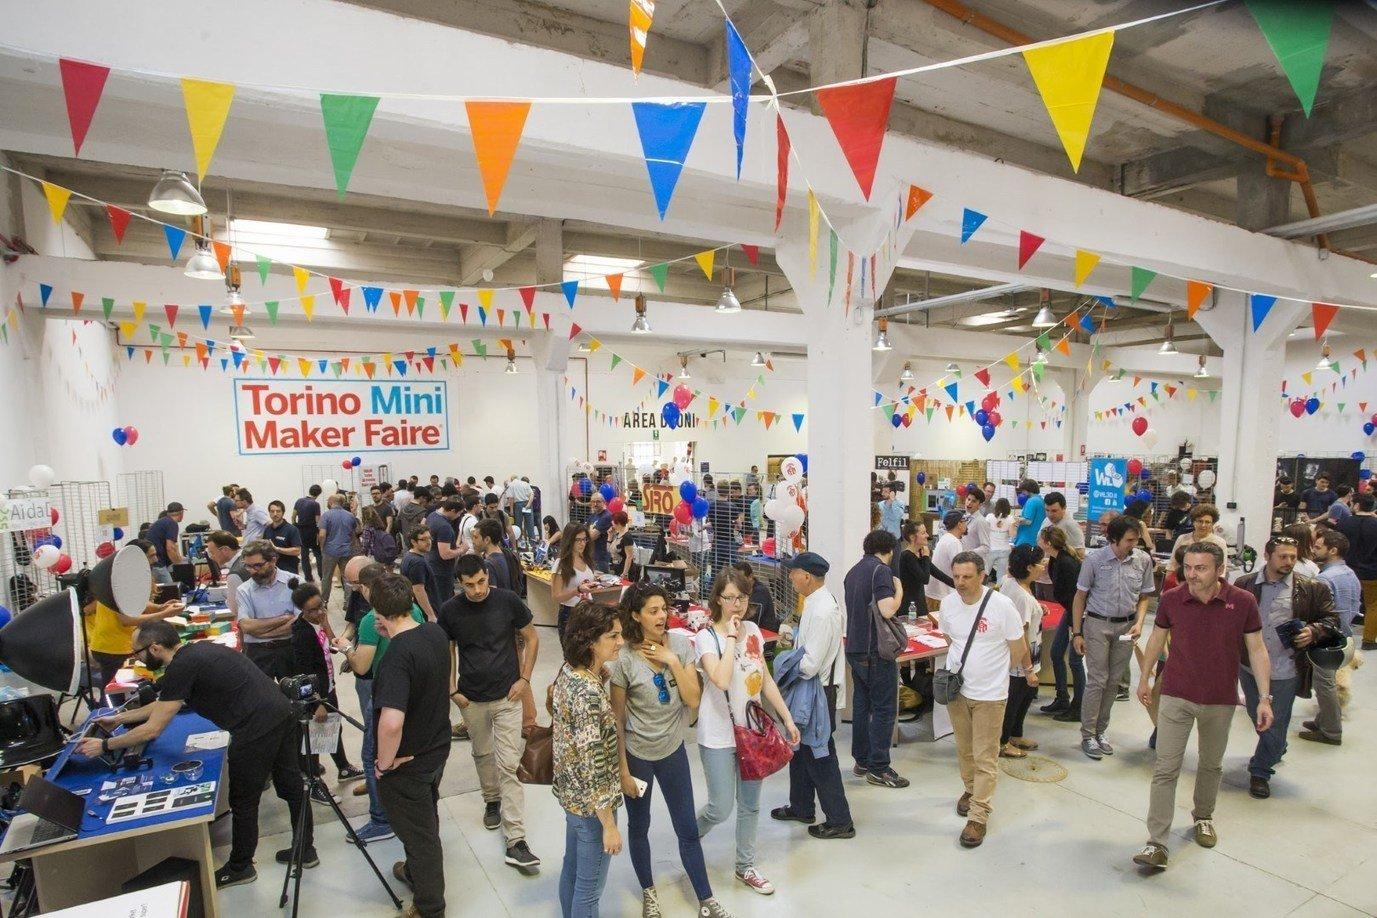 , Explore The Circular Economy With The Torino Mini Maker Faire | Make:, The Circular Economy